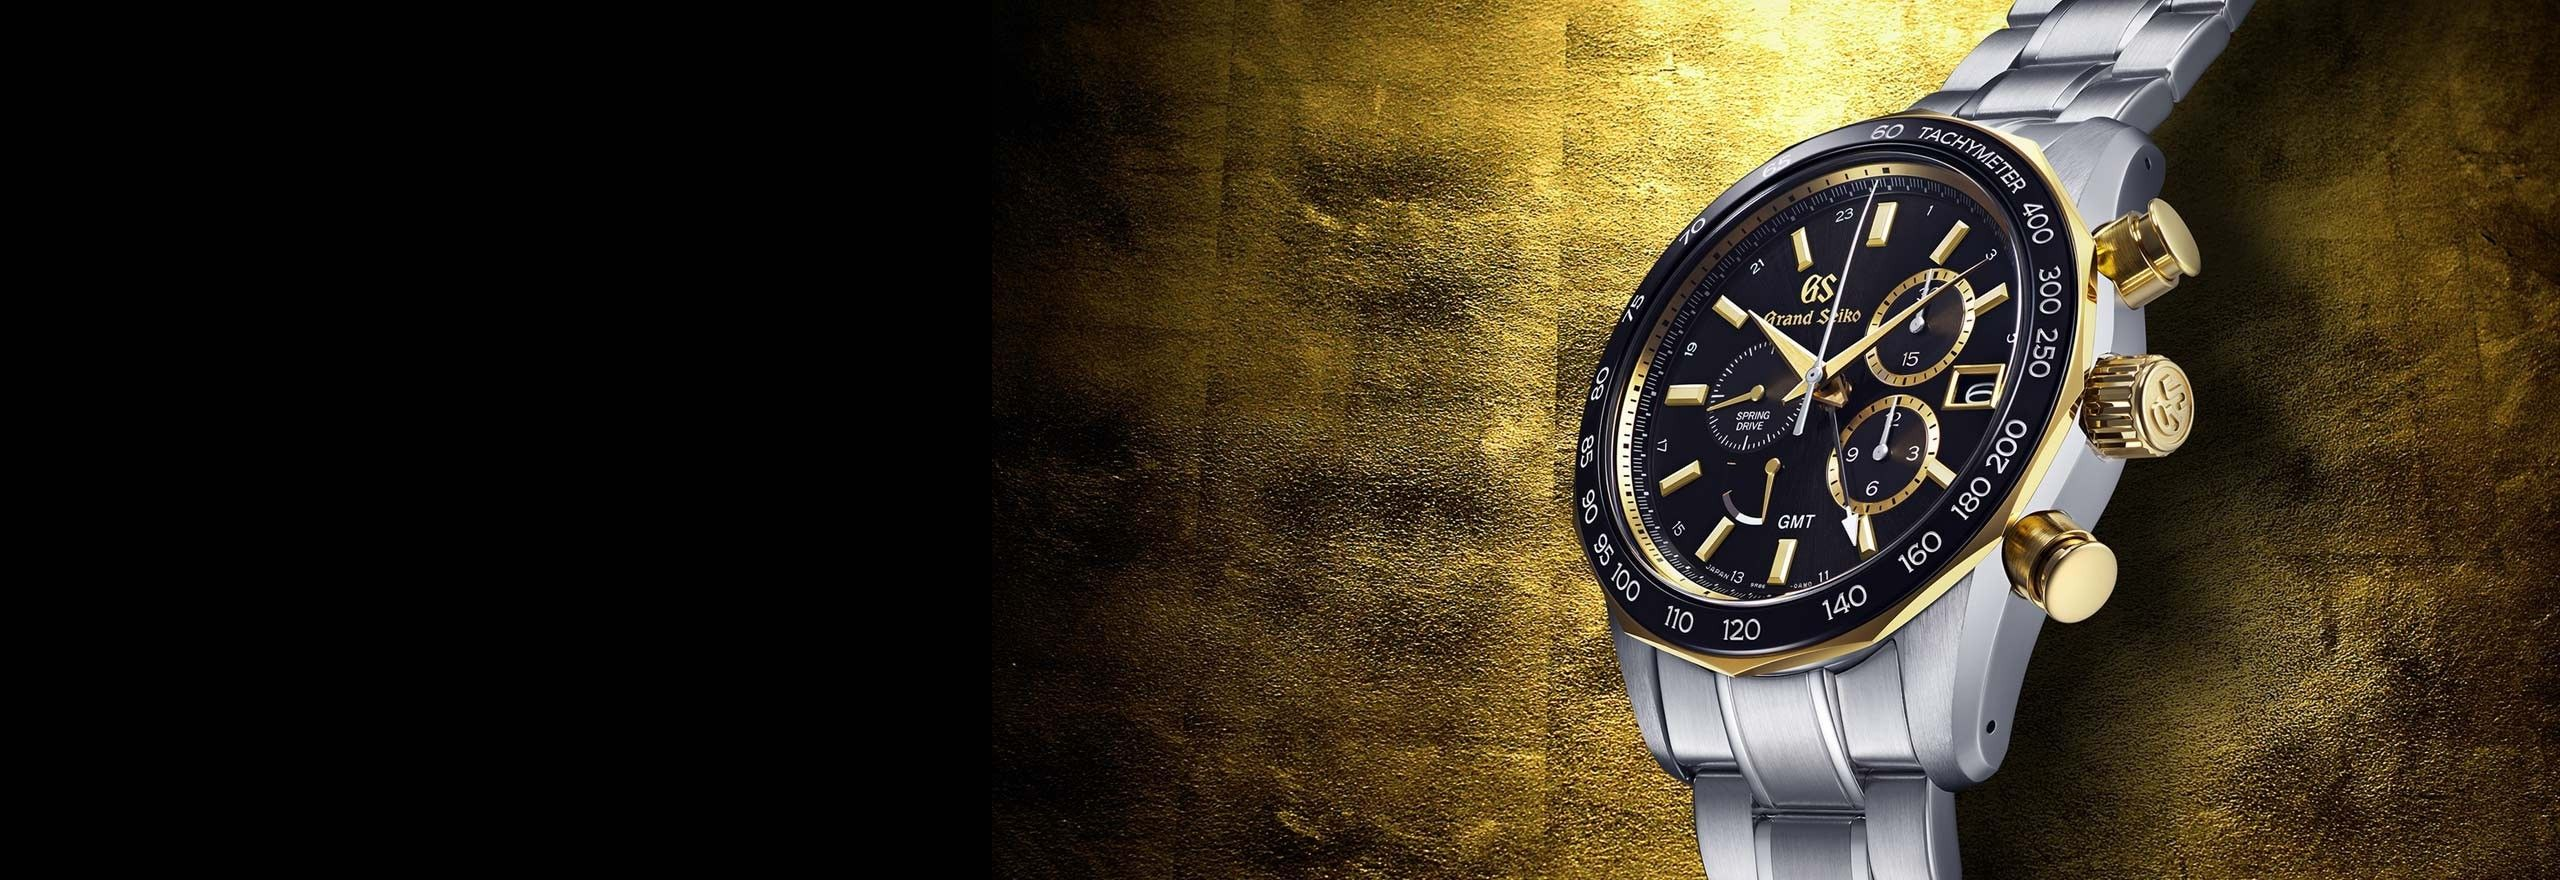 Relojes Grand Seiko Hombre. Seiko Boutique Madrid Tienda Oficial